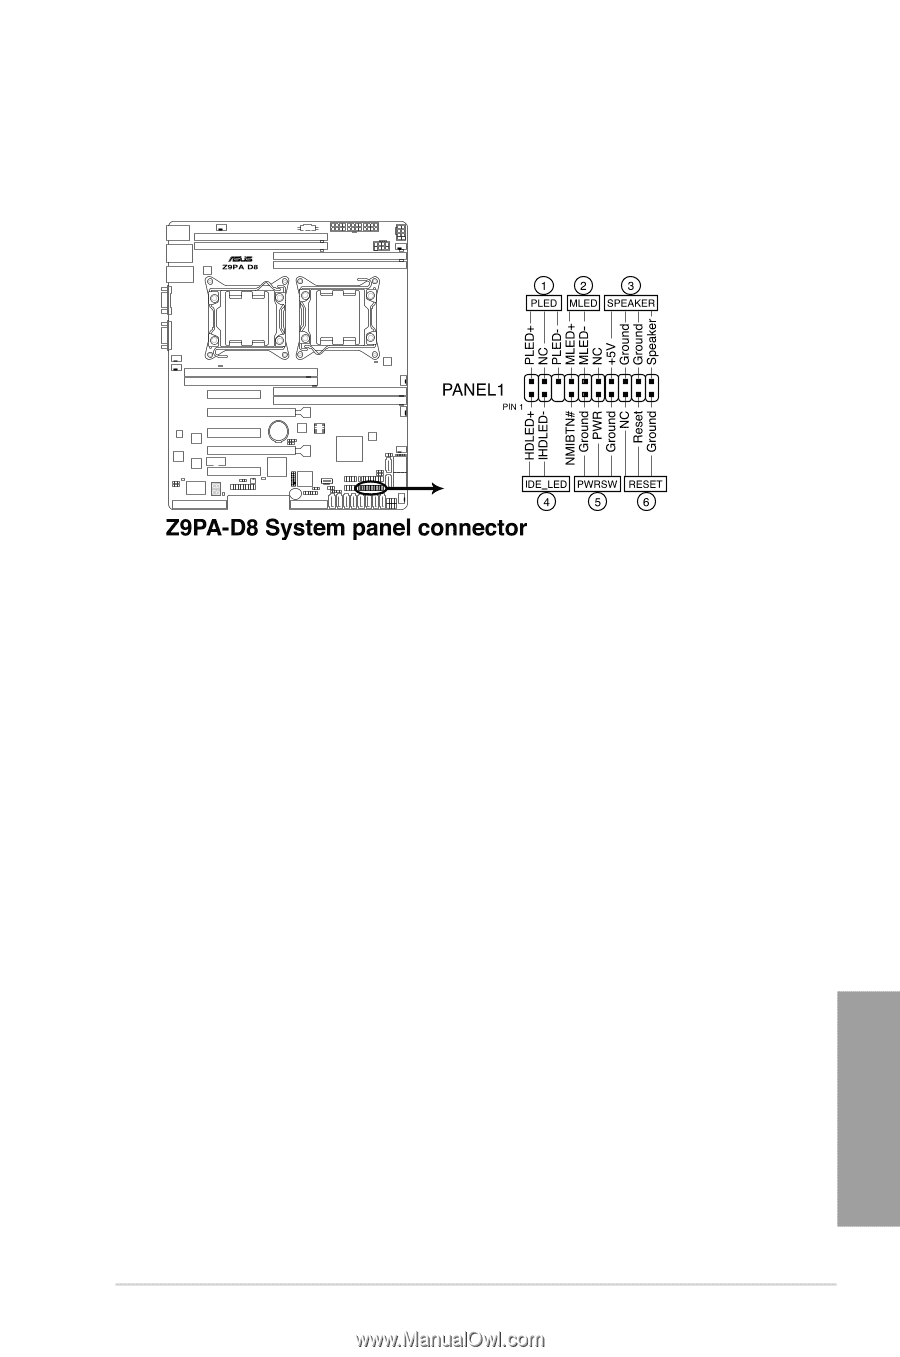 ASUS TS700-X7PS4 ASMEDIA USB 3.0 DOWNLOAD DRIVERS